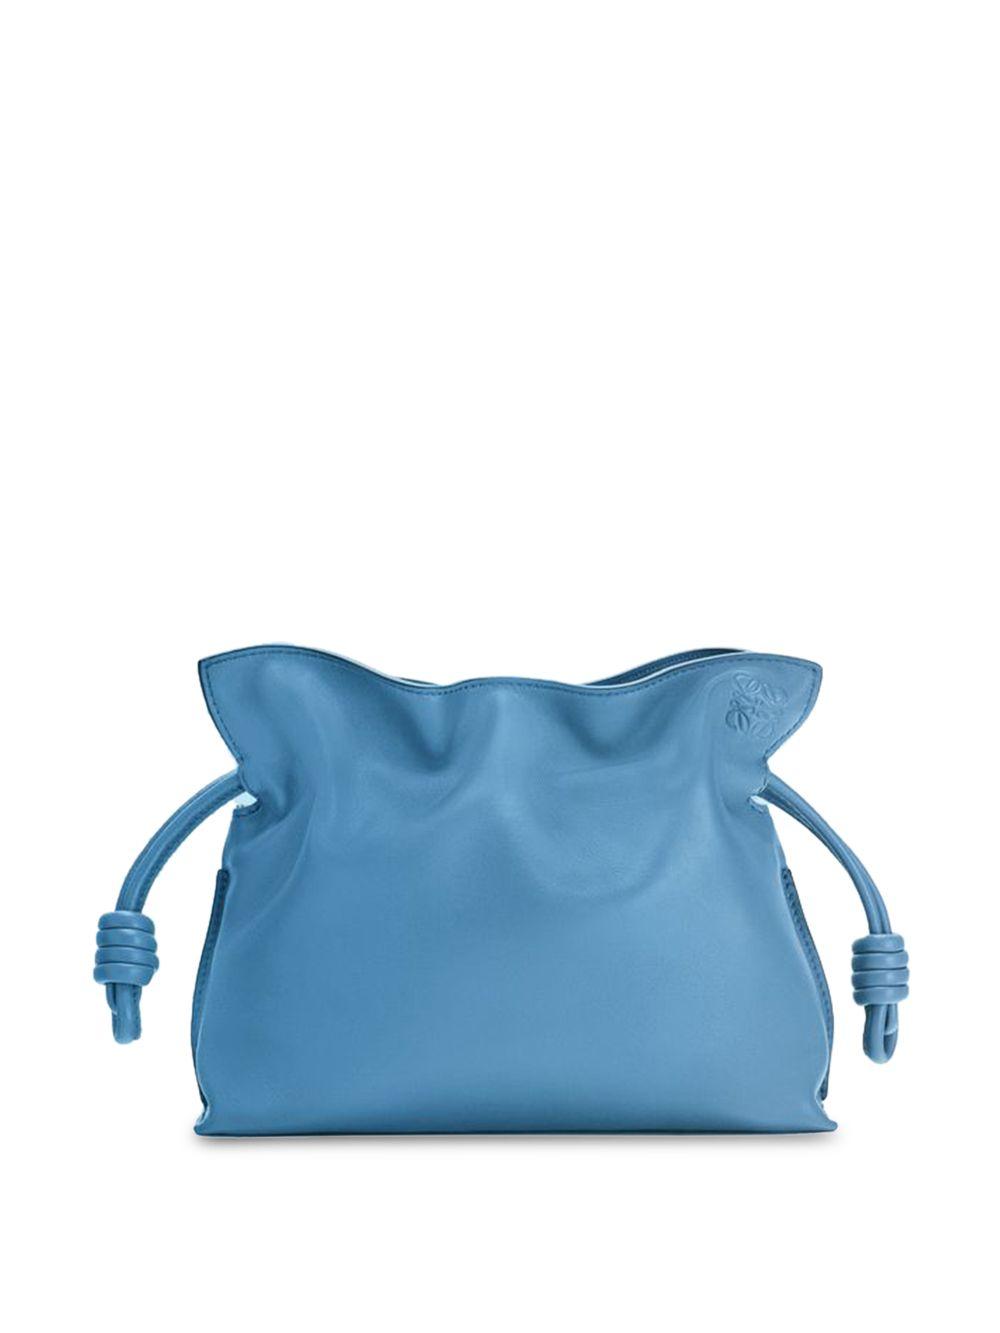 Flamenco Clutch Bag